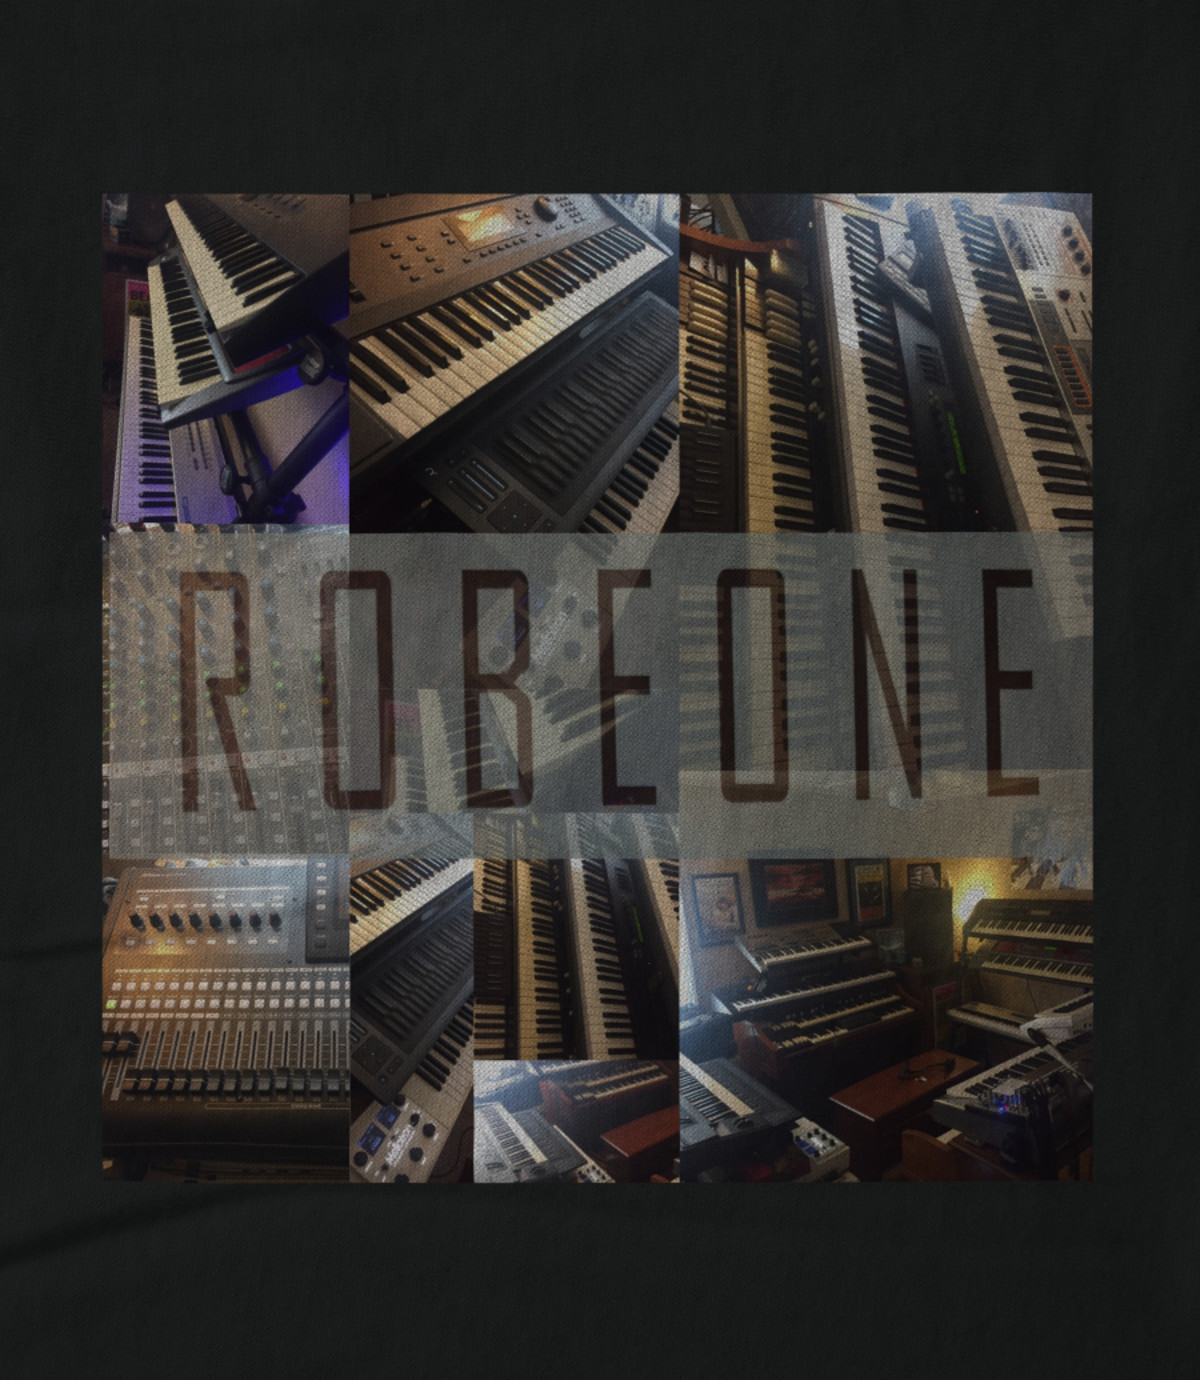 Robeone robeone 1518794232